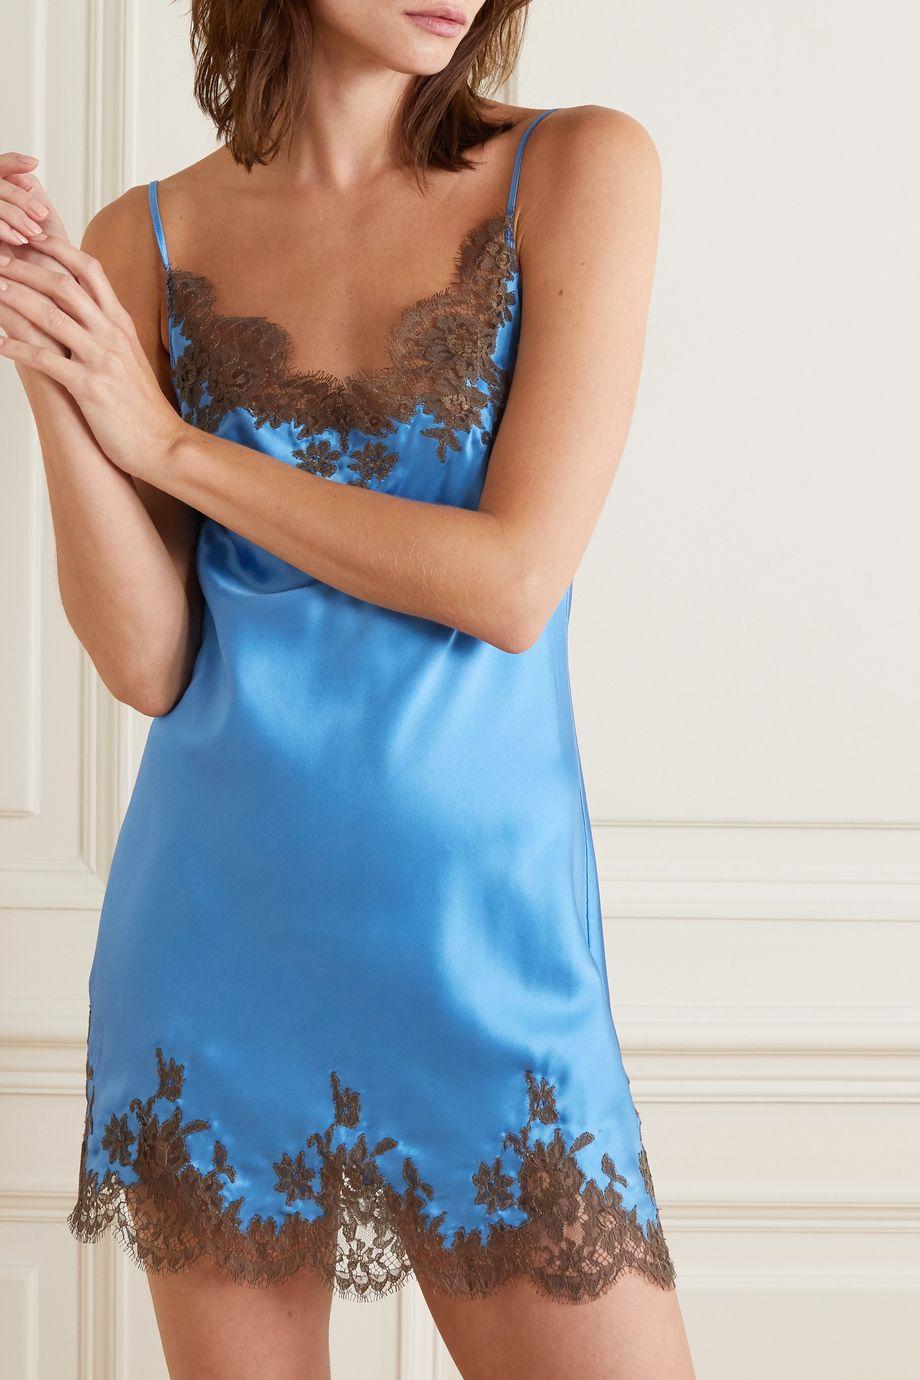 I.D. Sarrieri Chantilly lace-trimmed silk-blend satin chemise